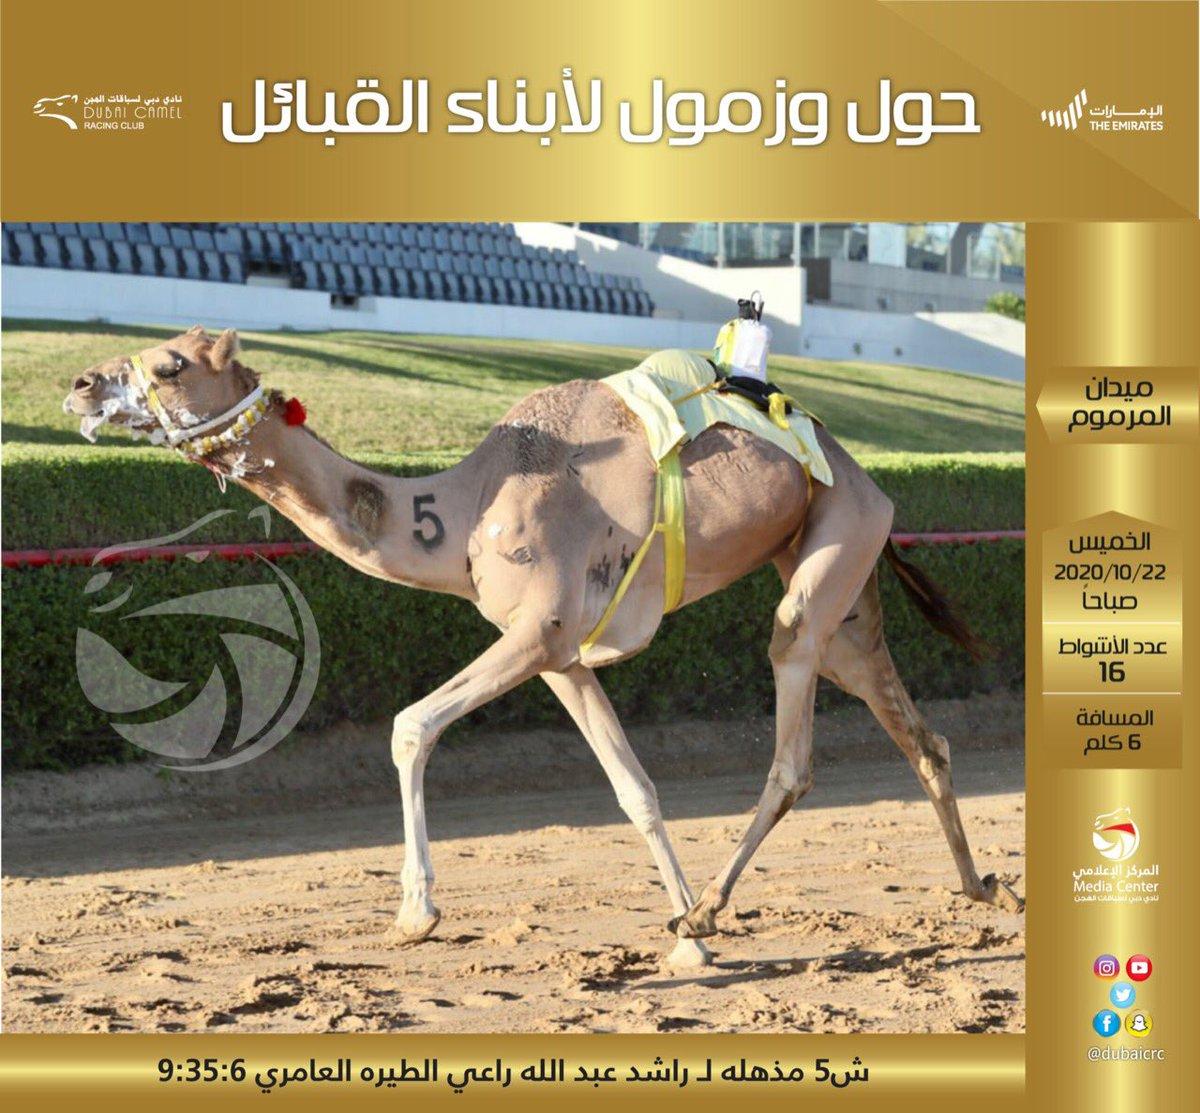 #الاصايل #نادي_دبي_لسباقات_الهجن #المركز_الاعلامي #فزاع #faz3  #almarmoom #Dubaicrc #camel #Racing_club #Dubai #VisitDubai  #uae #Camelrace #sports #fun #camels #heritage #race #tourism #emirates #photography #dubailife #DCRC #mydubai https://t.co/TbgDs3gDHo